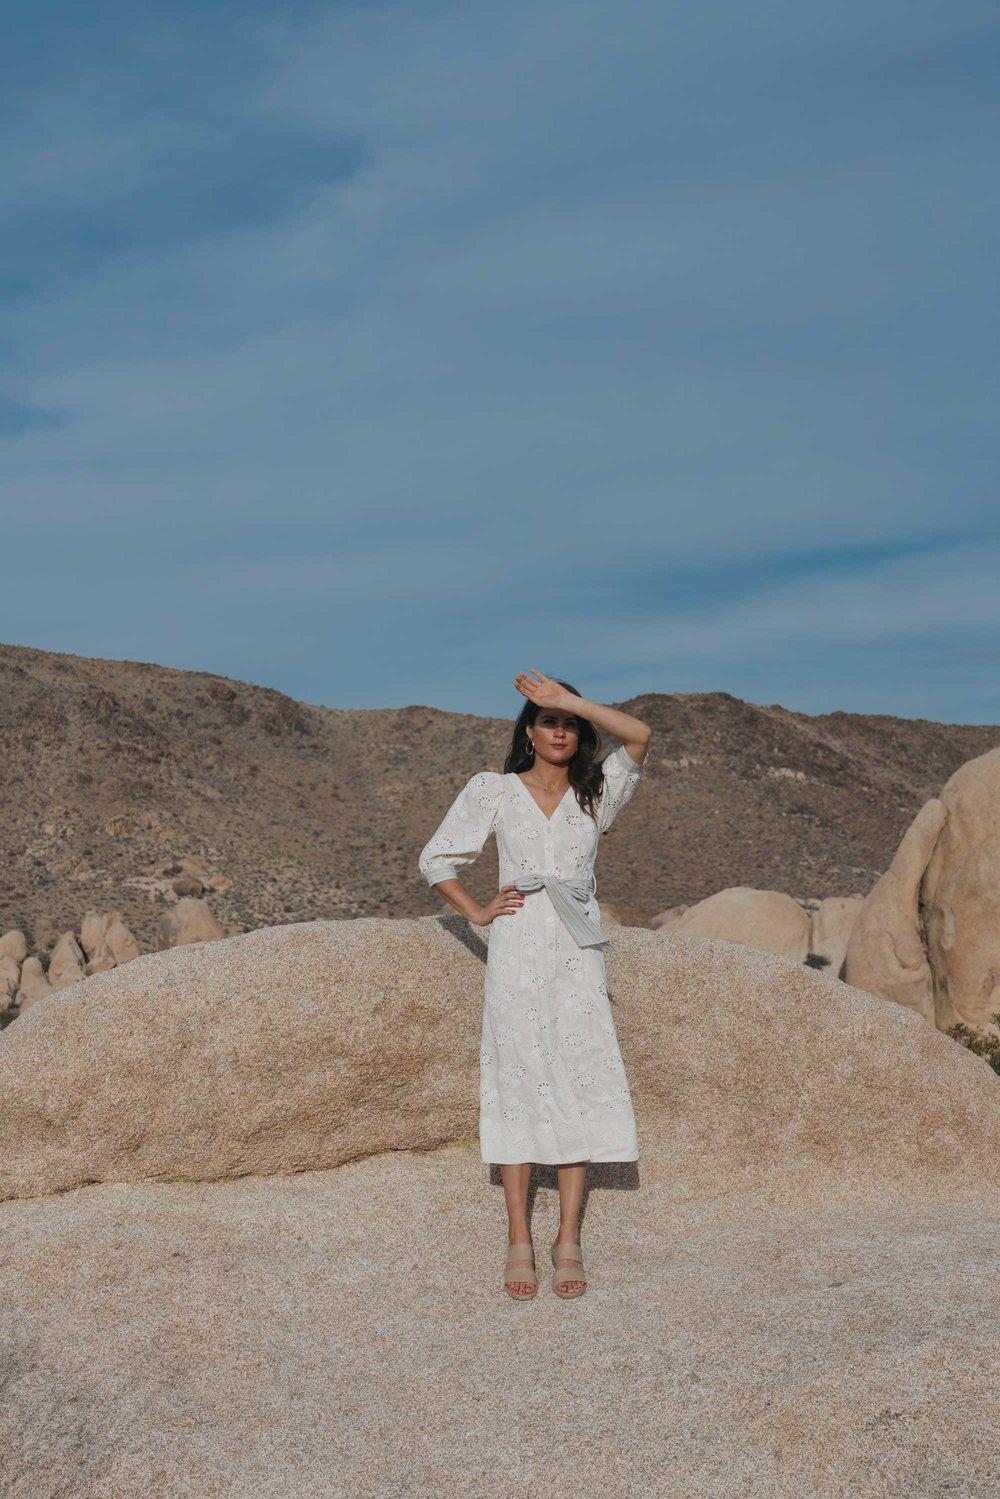 Rebecca-Taylor-vintage-inspired-eyelet-dress-Joshua-Tree-Festival-Outfit--15.jpg